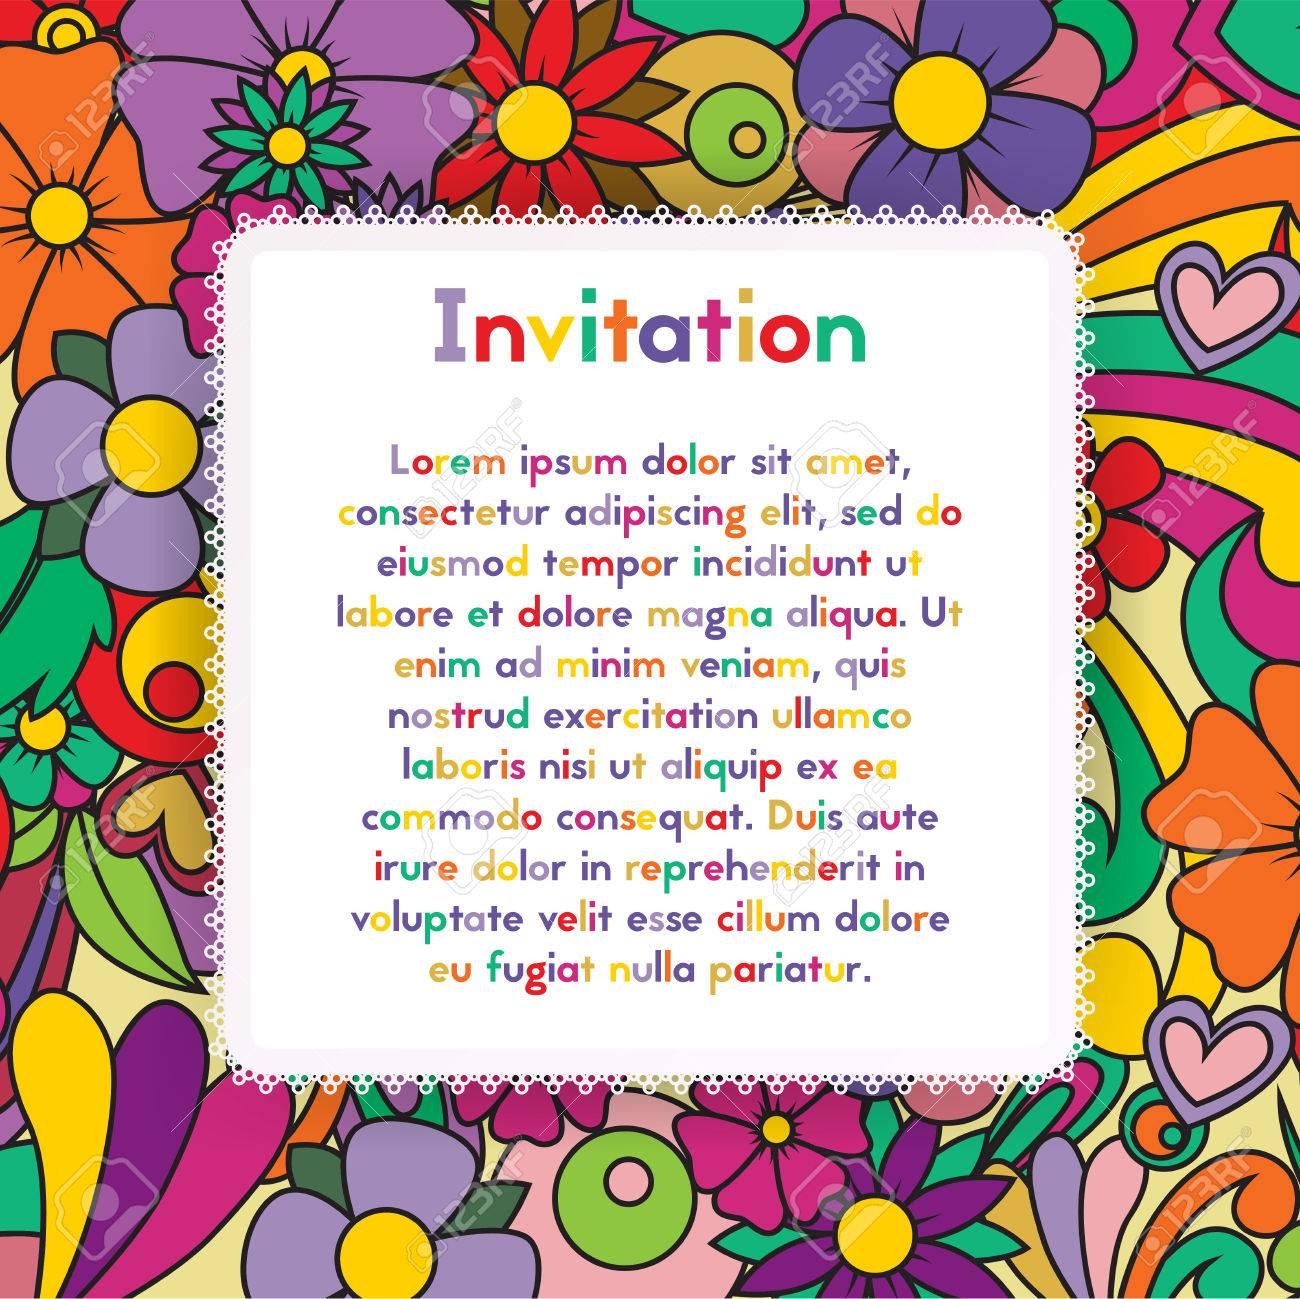 Invitacion Con Estampado De Flores Zentangle Tarjeta Zen Enredo